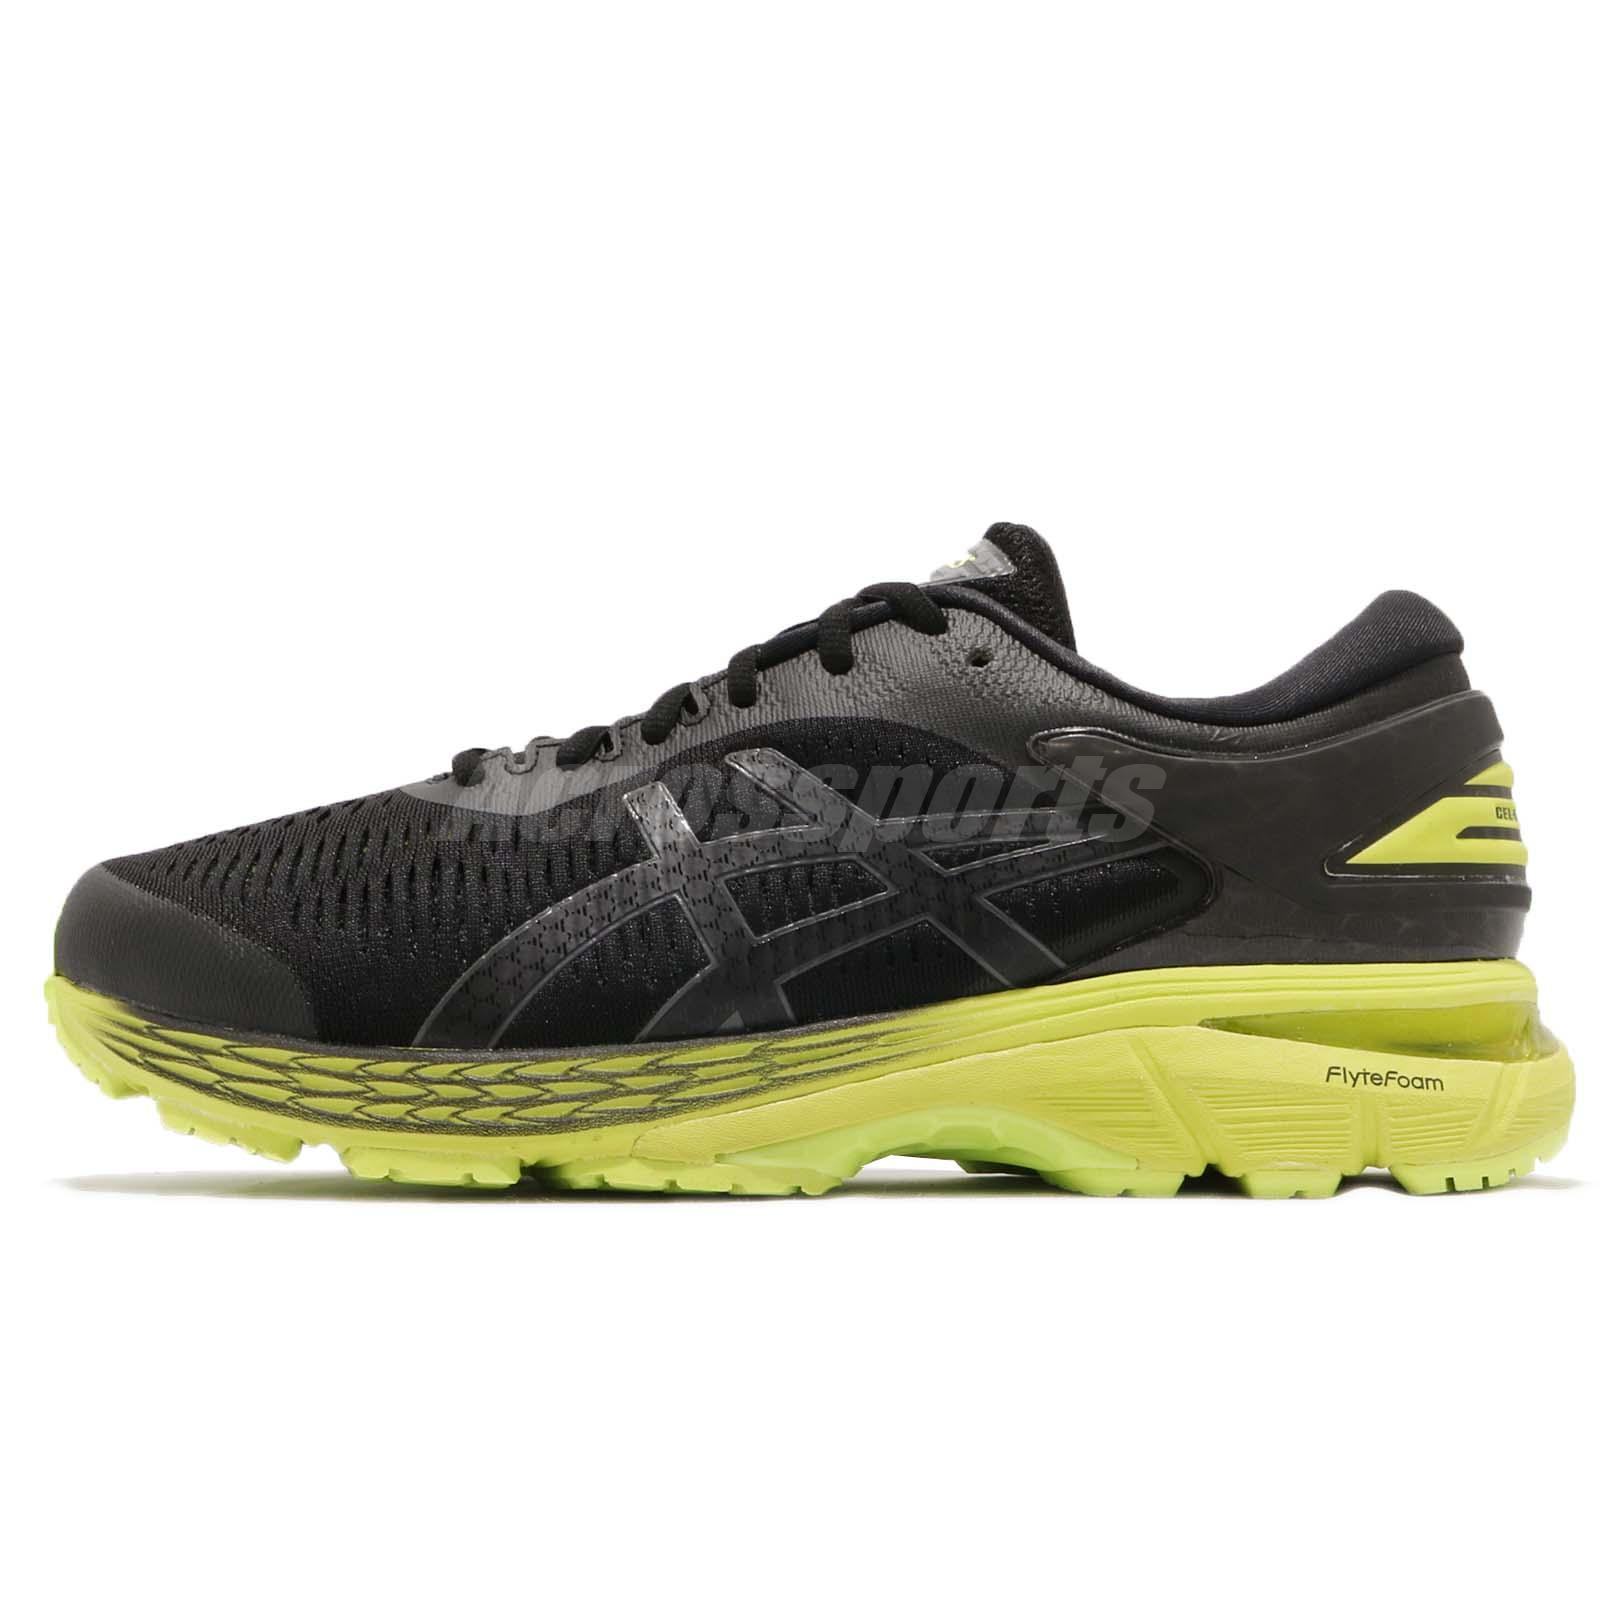 1e3ae24ed Asics Gel-Kayano 25 2E Wide Black Neon Lime Mens Running Shoes 1011A02-9001